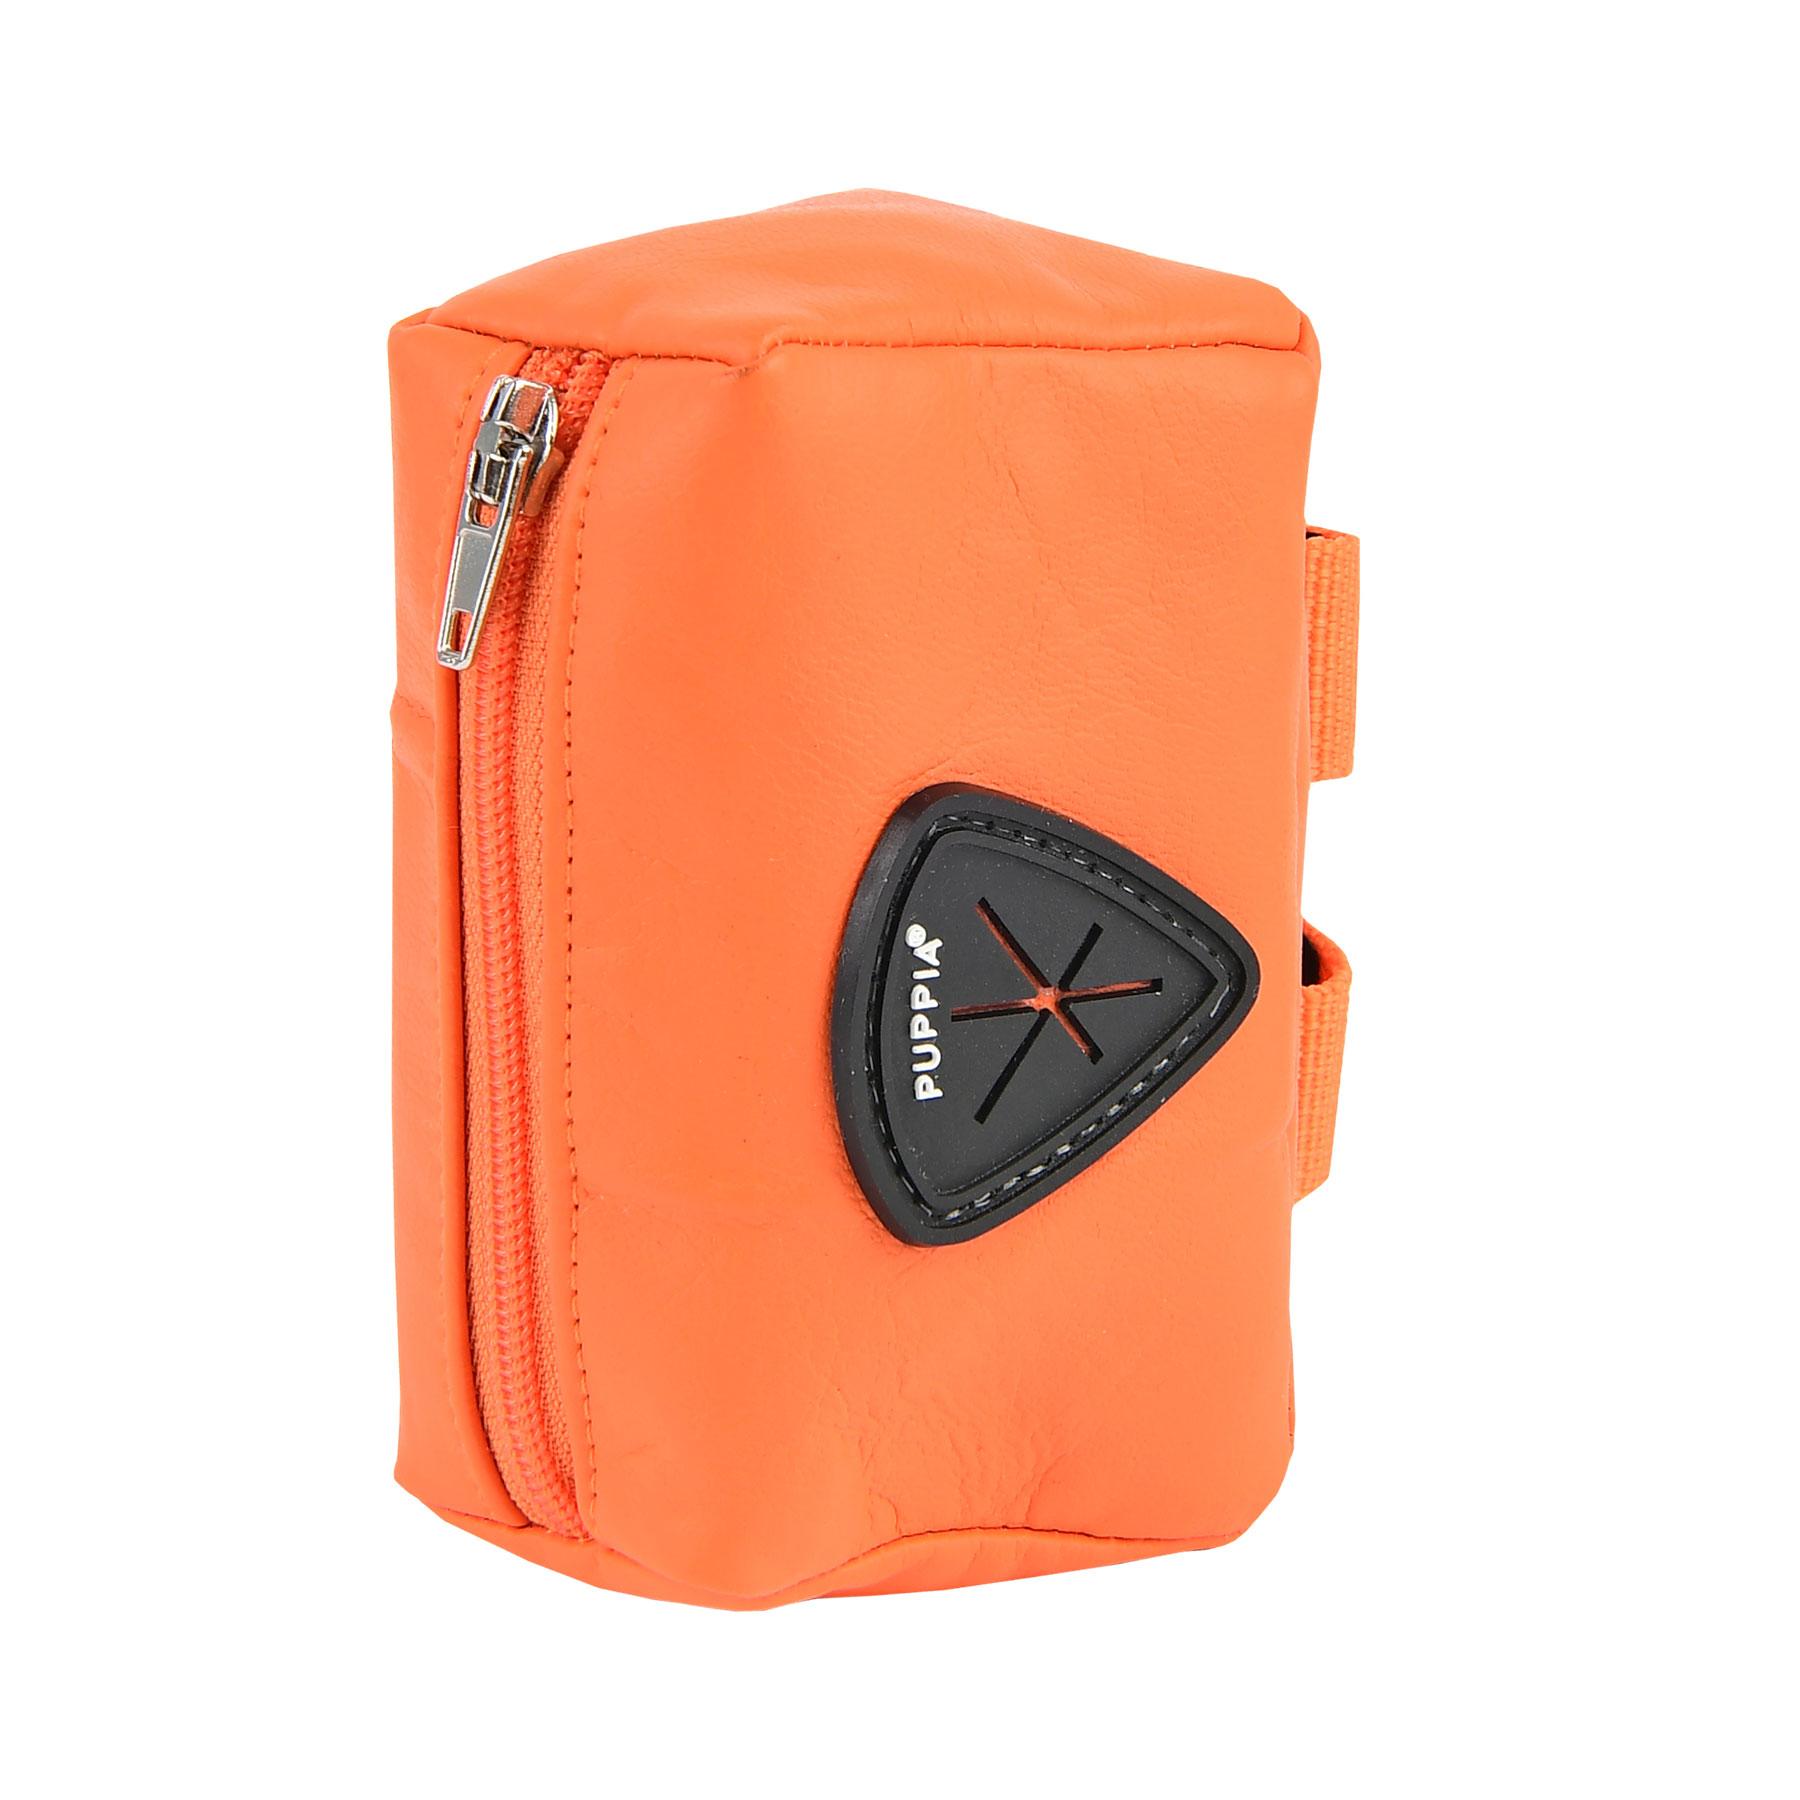 Jax Orange - Bajspåsehållare - Inne / Ute